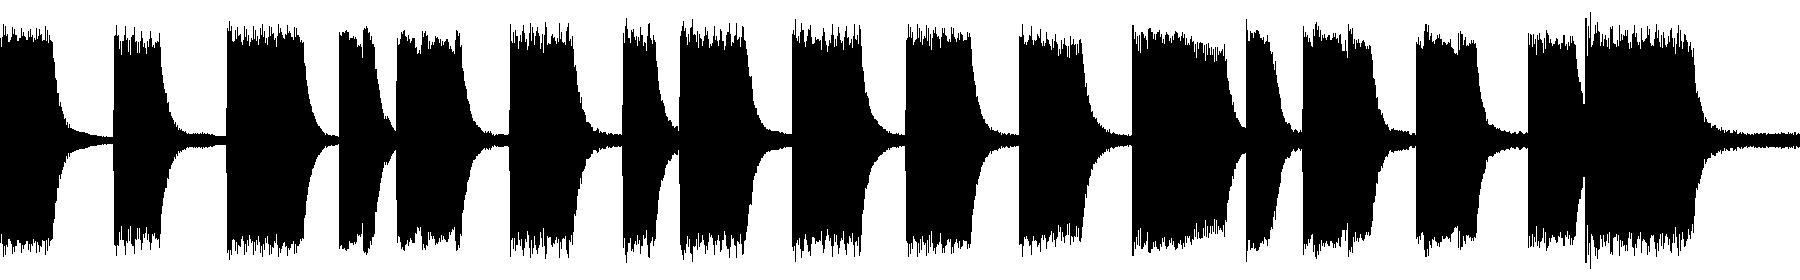 95 c 5